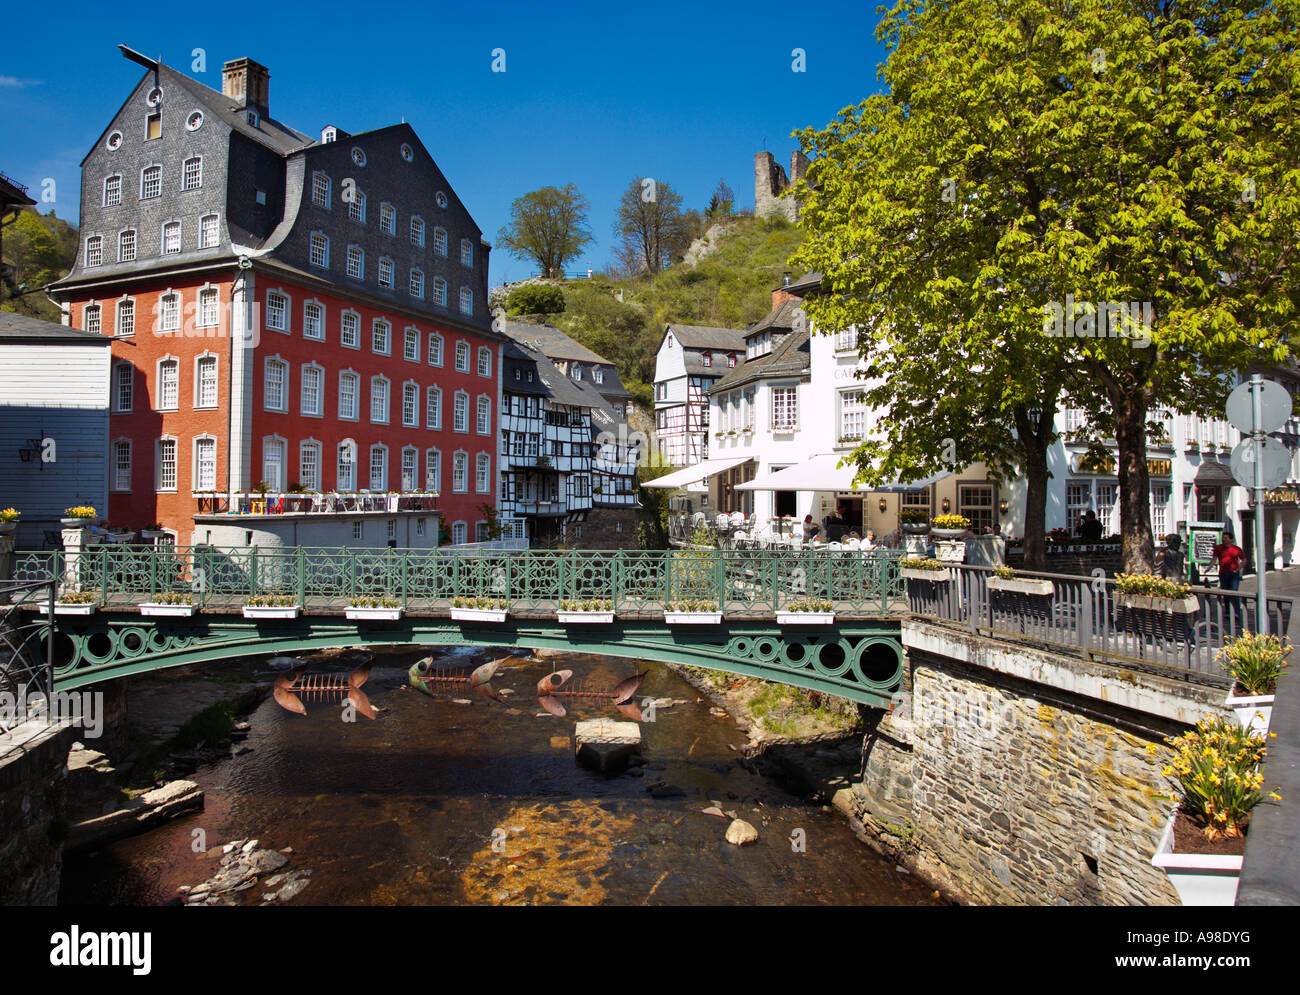 Rotes Haus on the River Rur at Monschau, Eifel Region, Germany ...